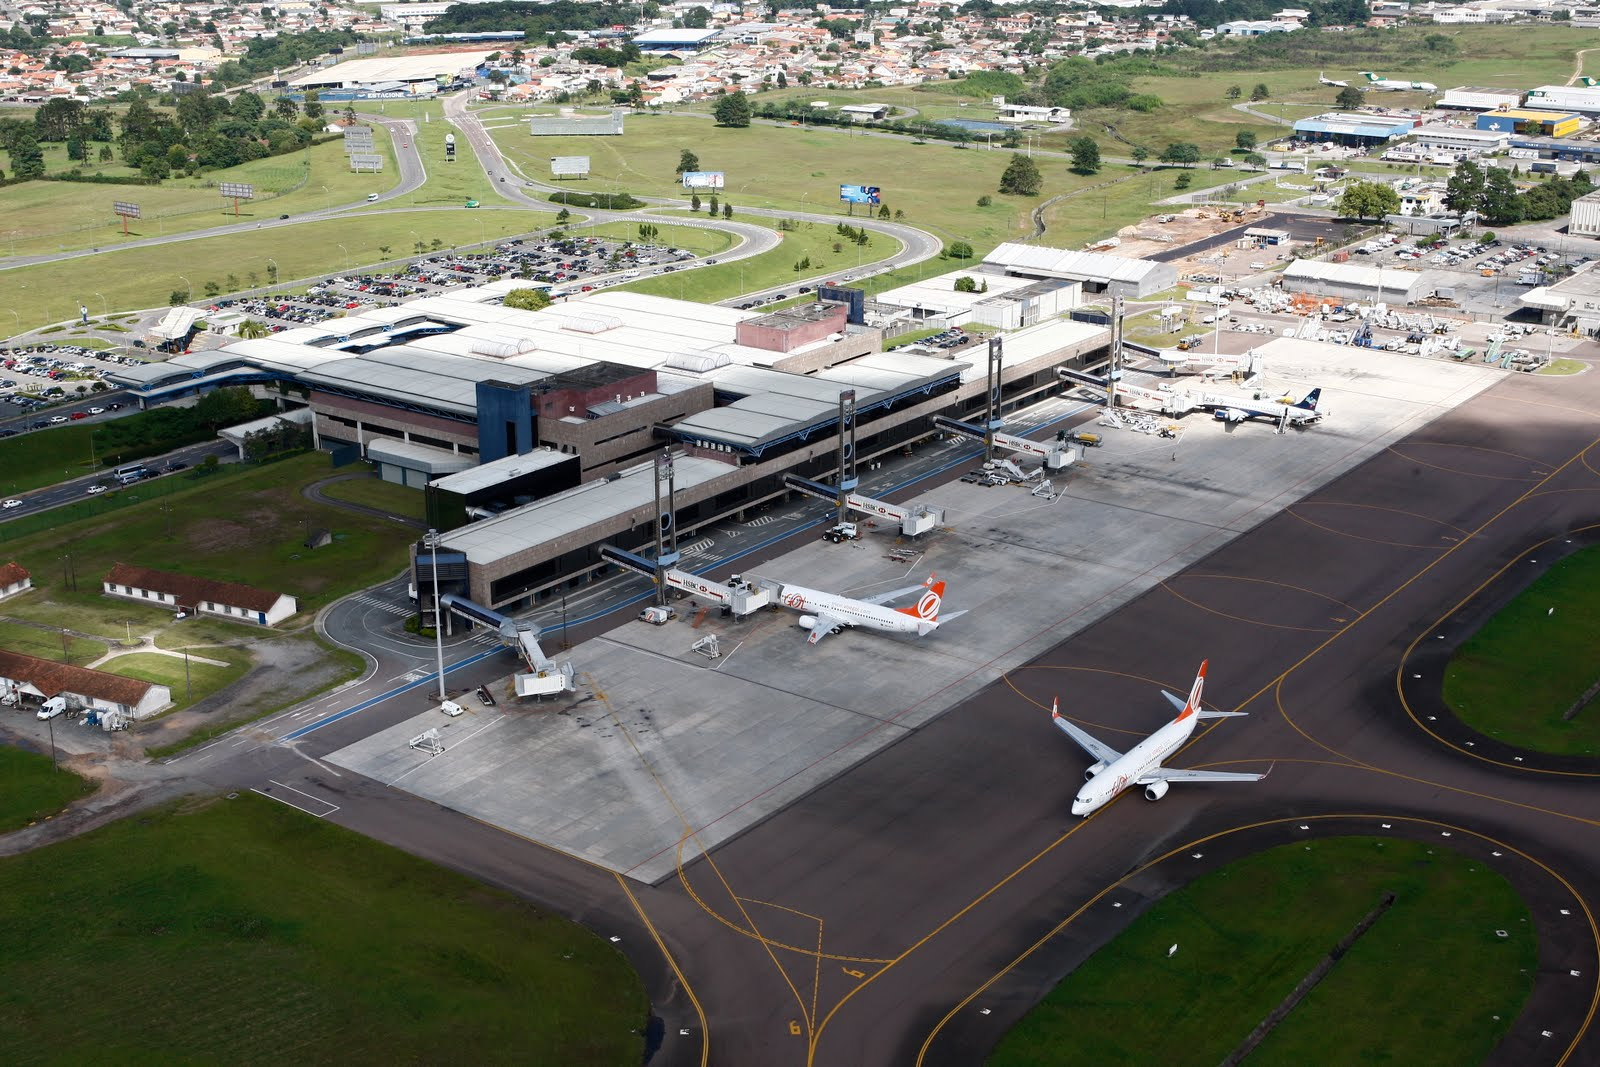 Aeroporto Afonso Pena Curitiba : Sbct newspaper aeroporto internacional afonso pena